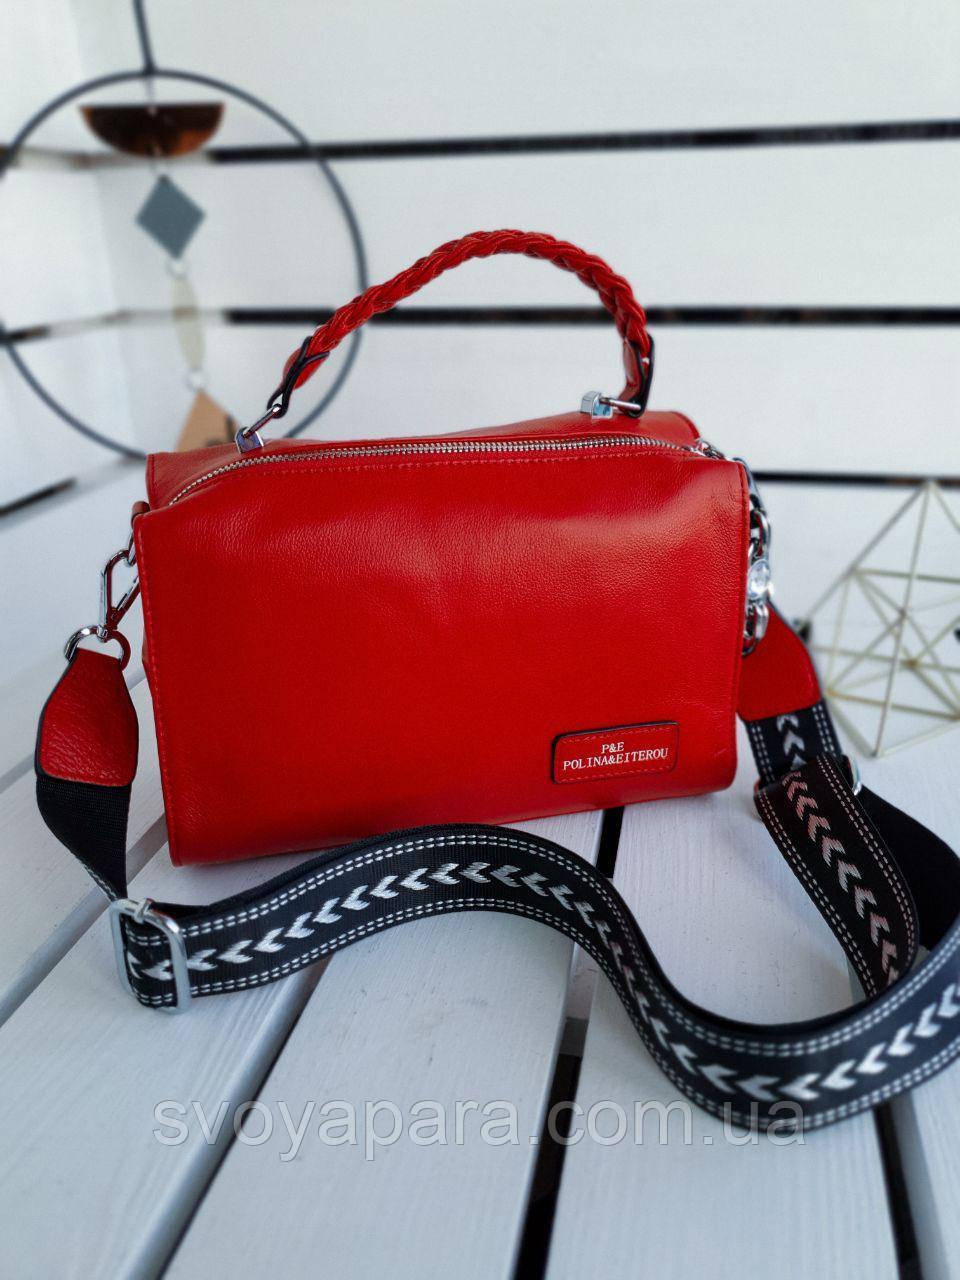 Кожаная женская сумка размером 26х16х12 см Красная (01266)